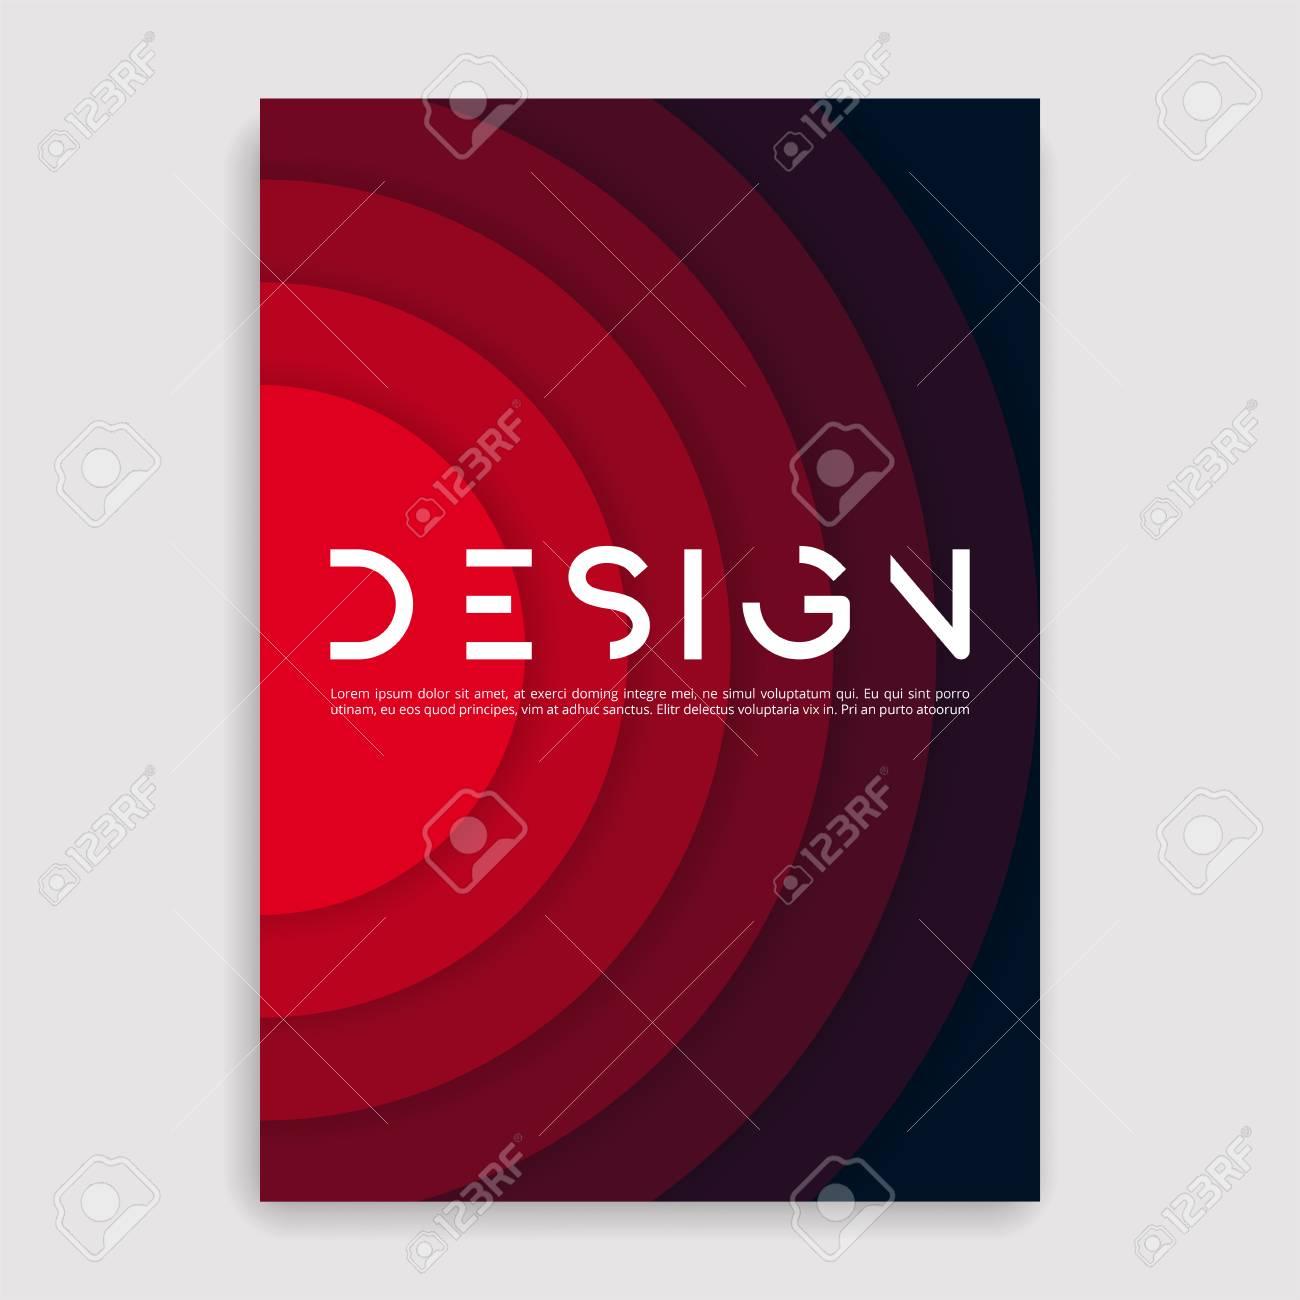 Brochure cover geometric design template. - 91782472